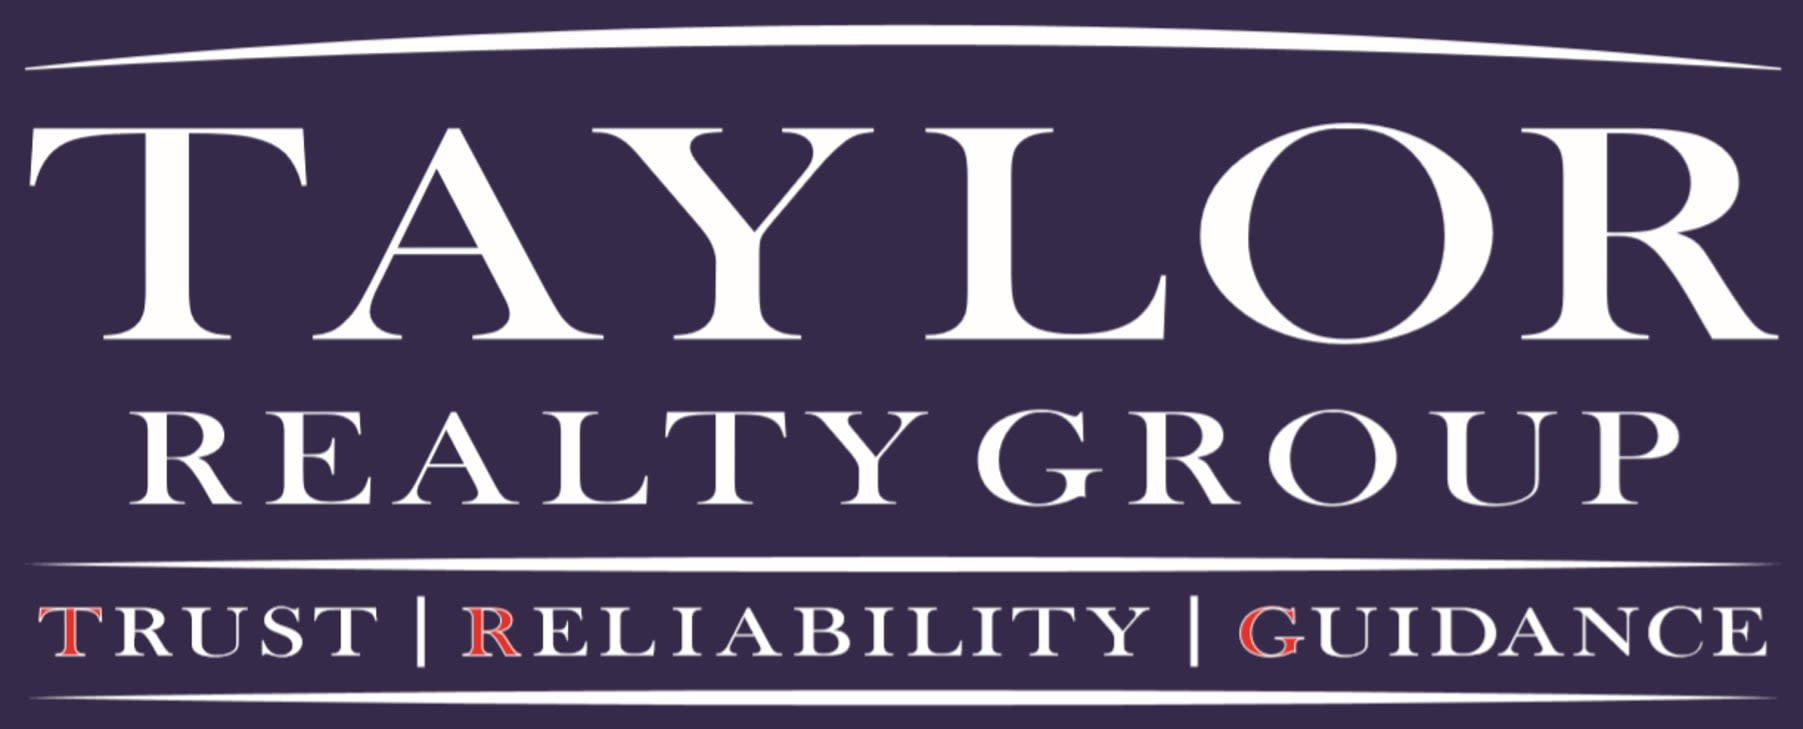 Trust, Reliability, Guidance